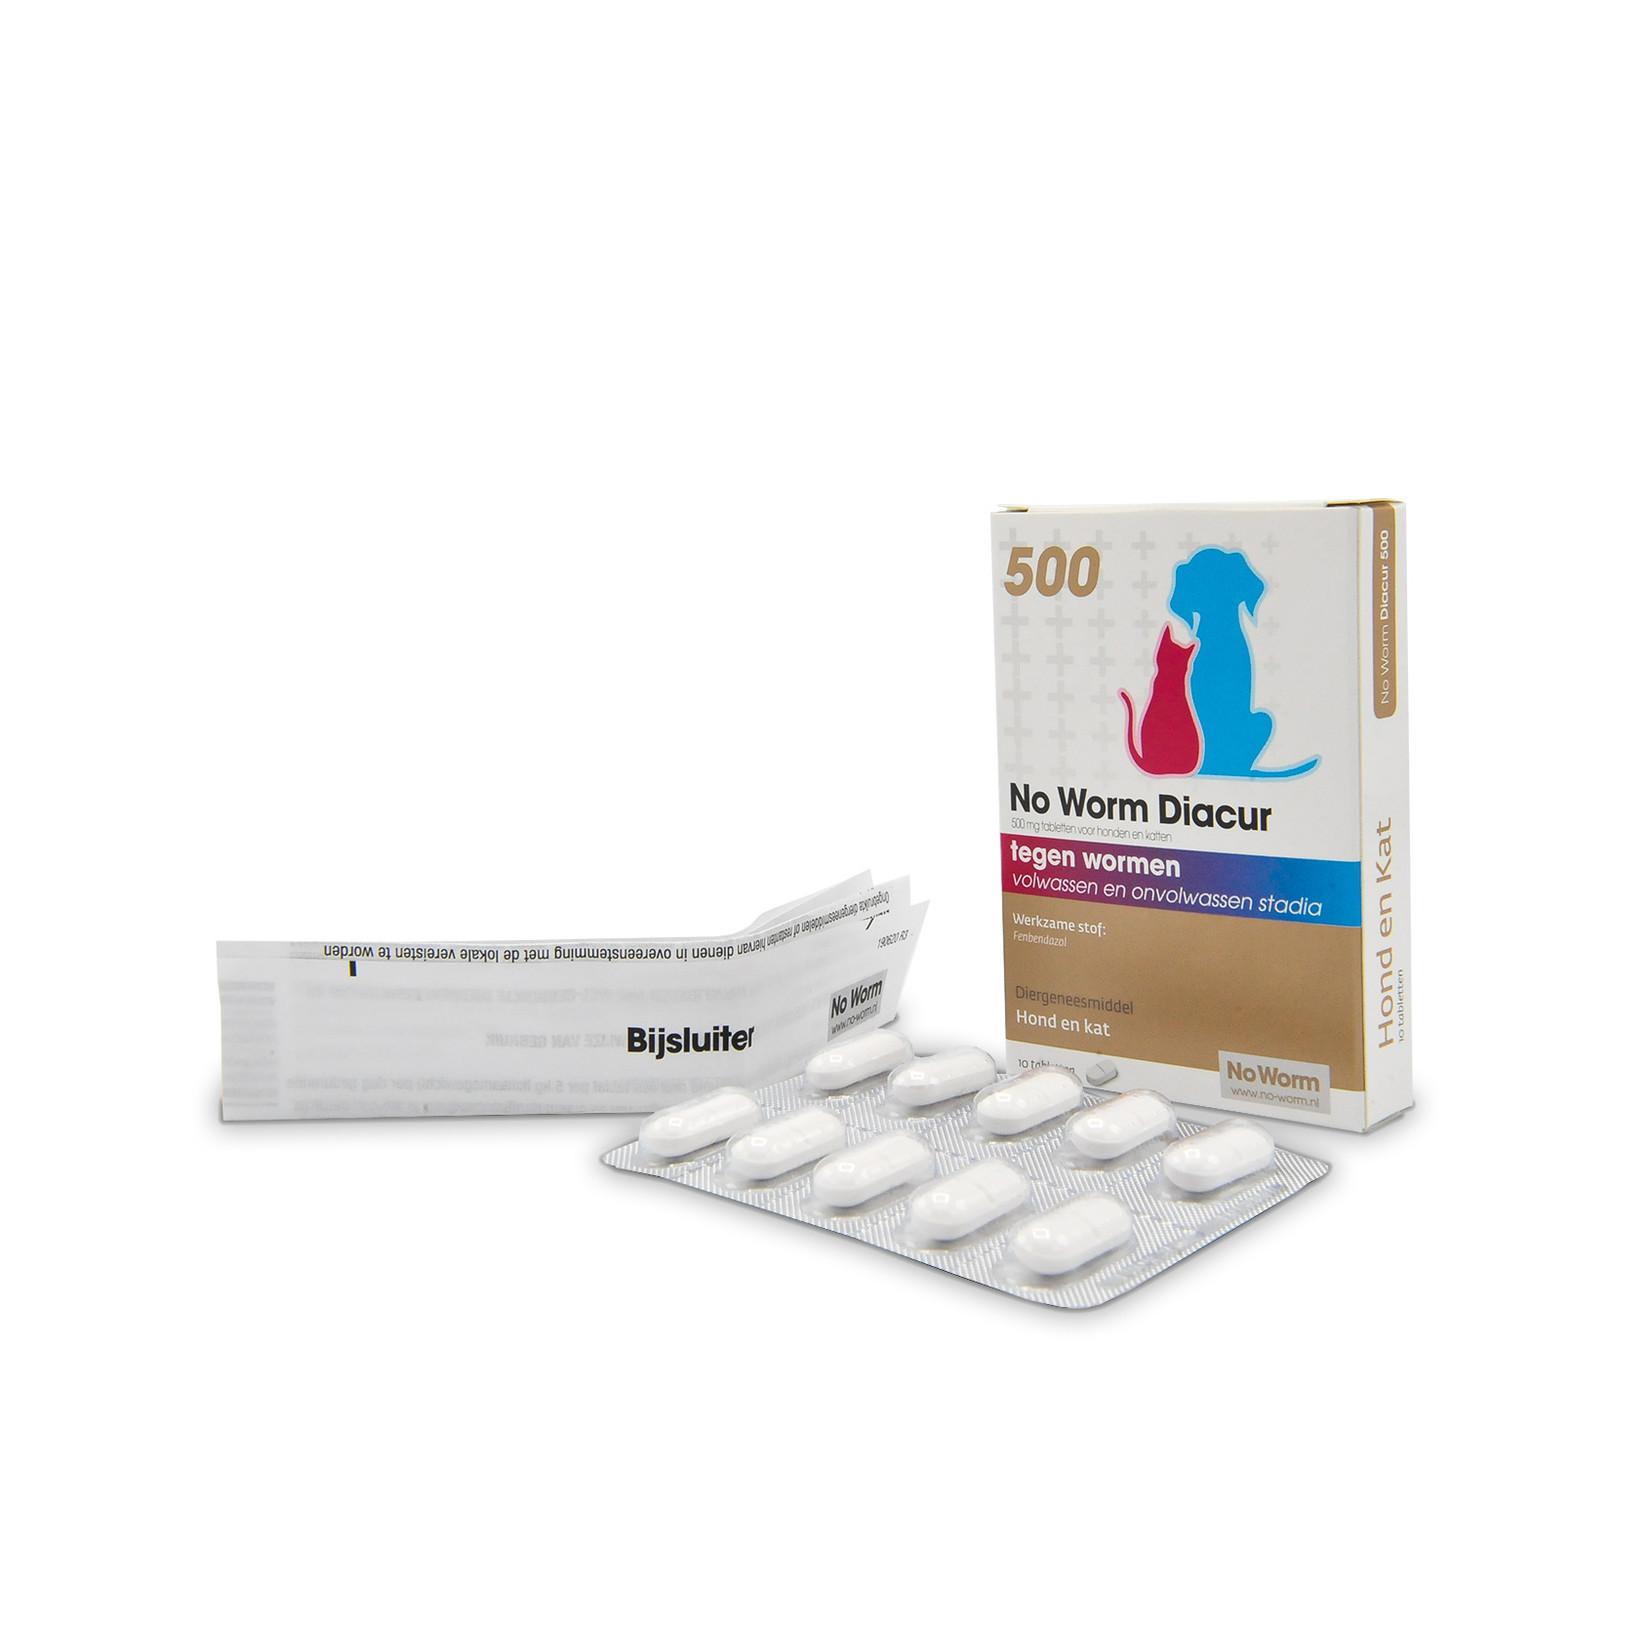 No Worm Diacur 500